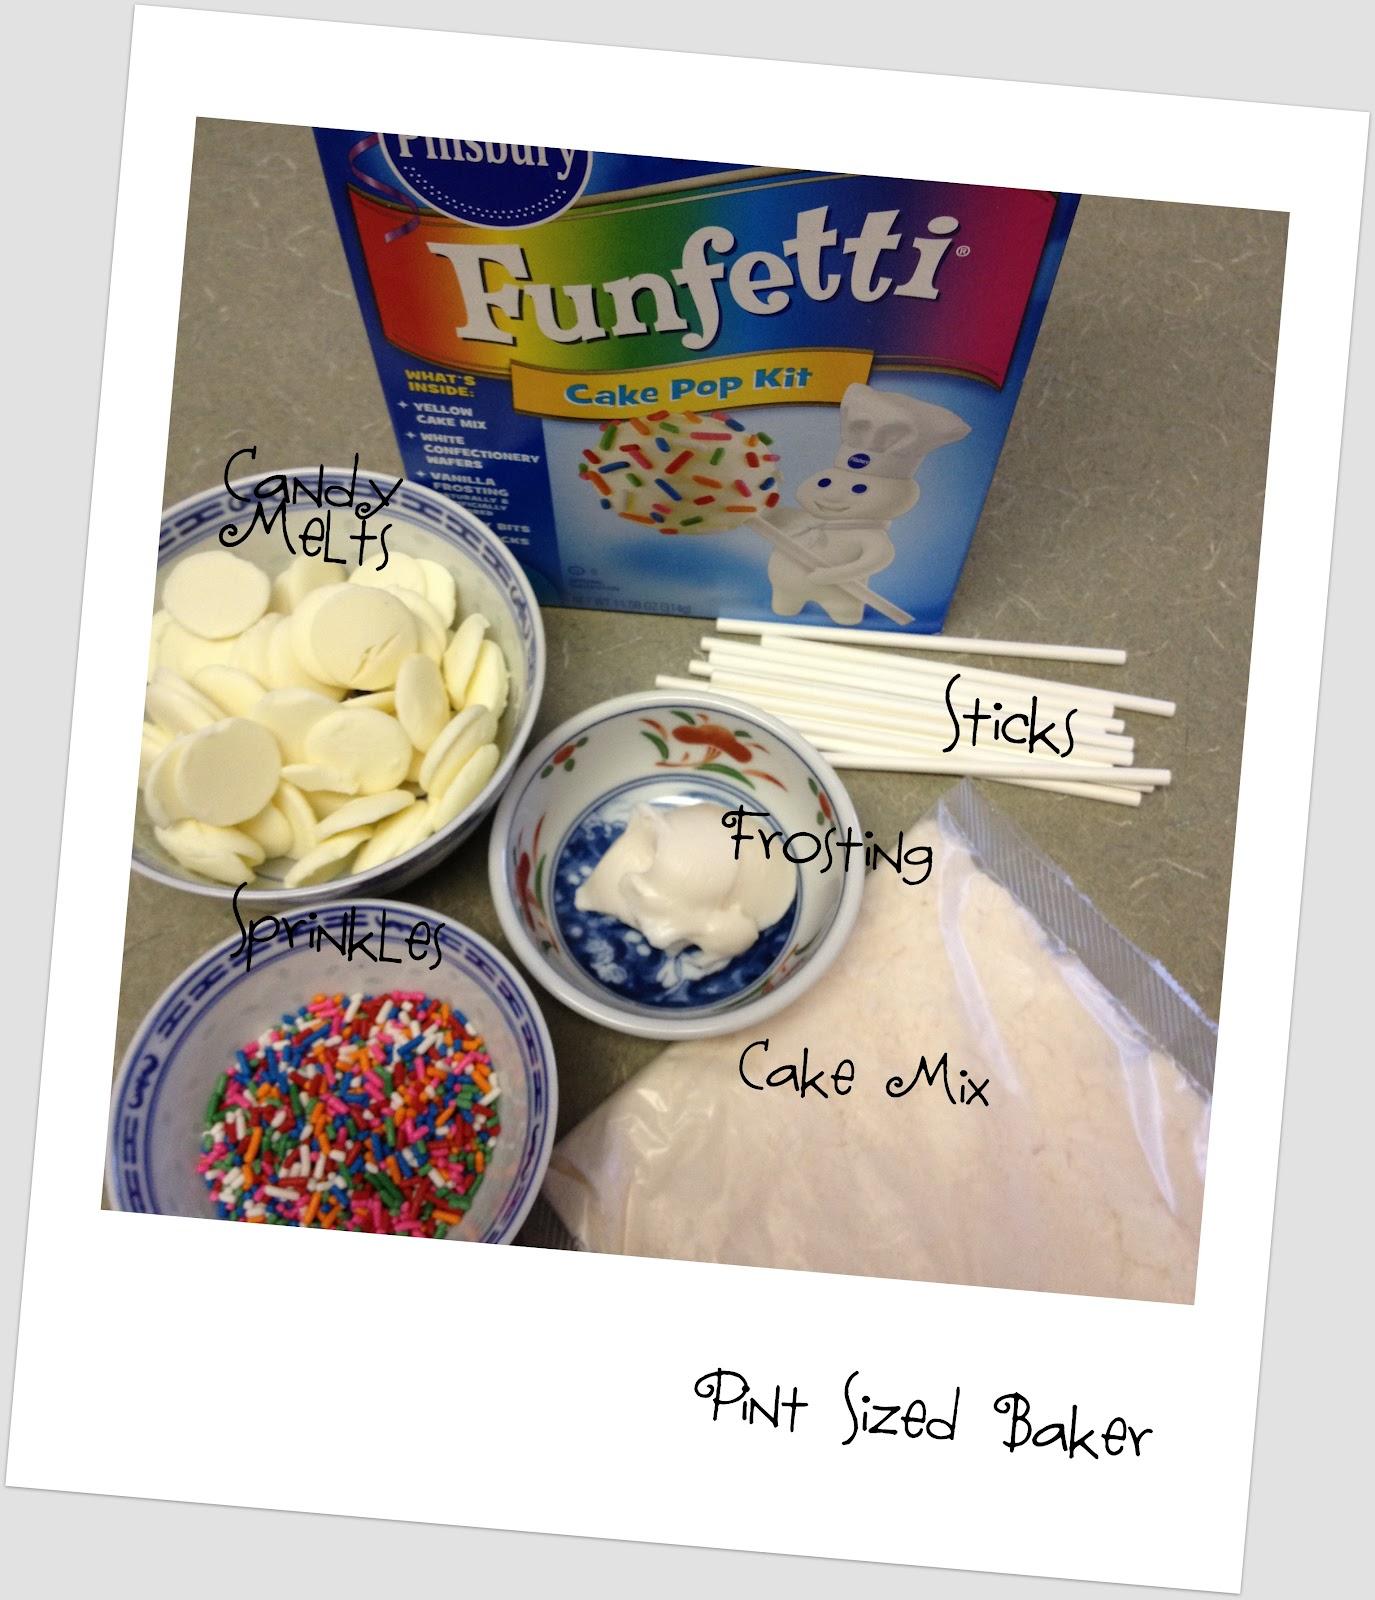 Funfetti Cake Pop Kit